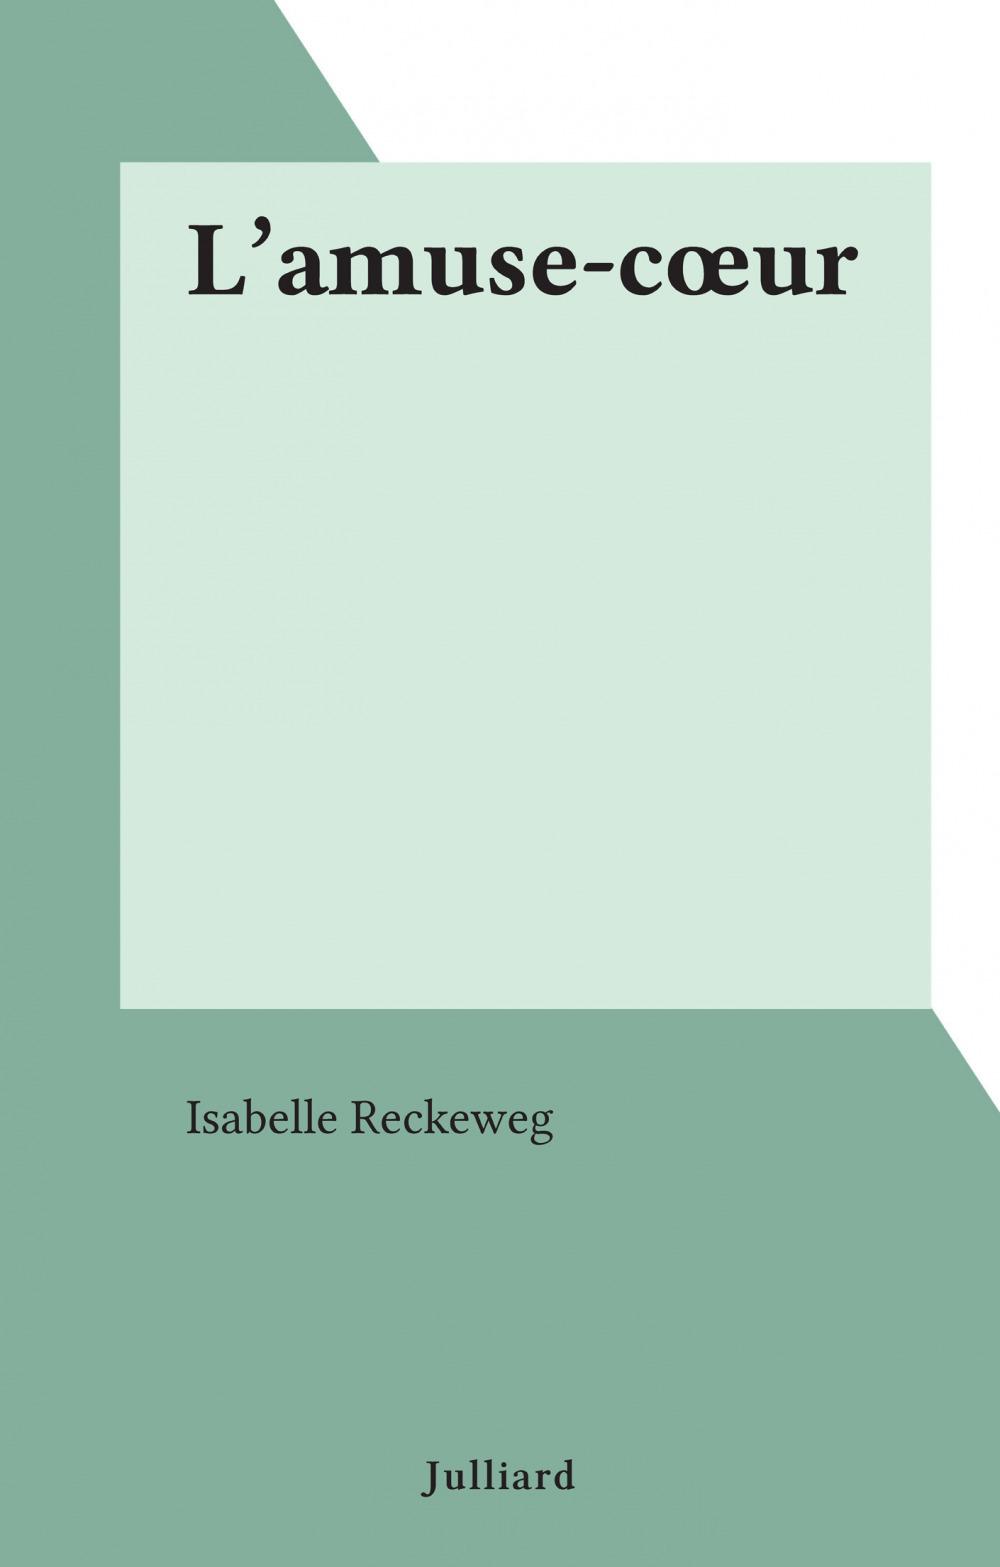 L'amuse-coeur  - Isabelle Reckeweg